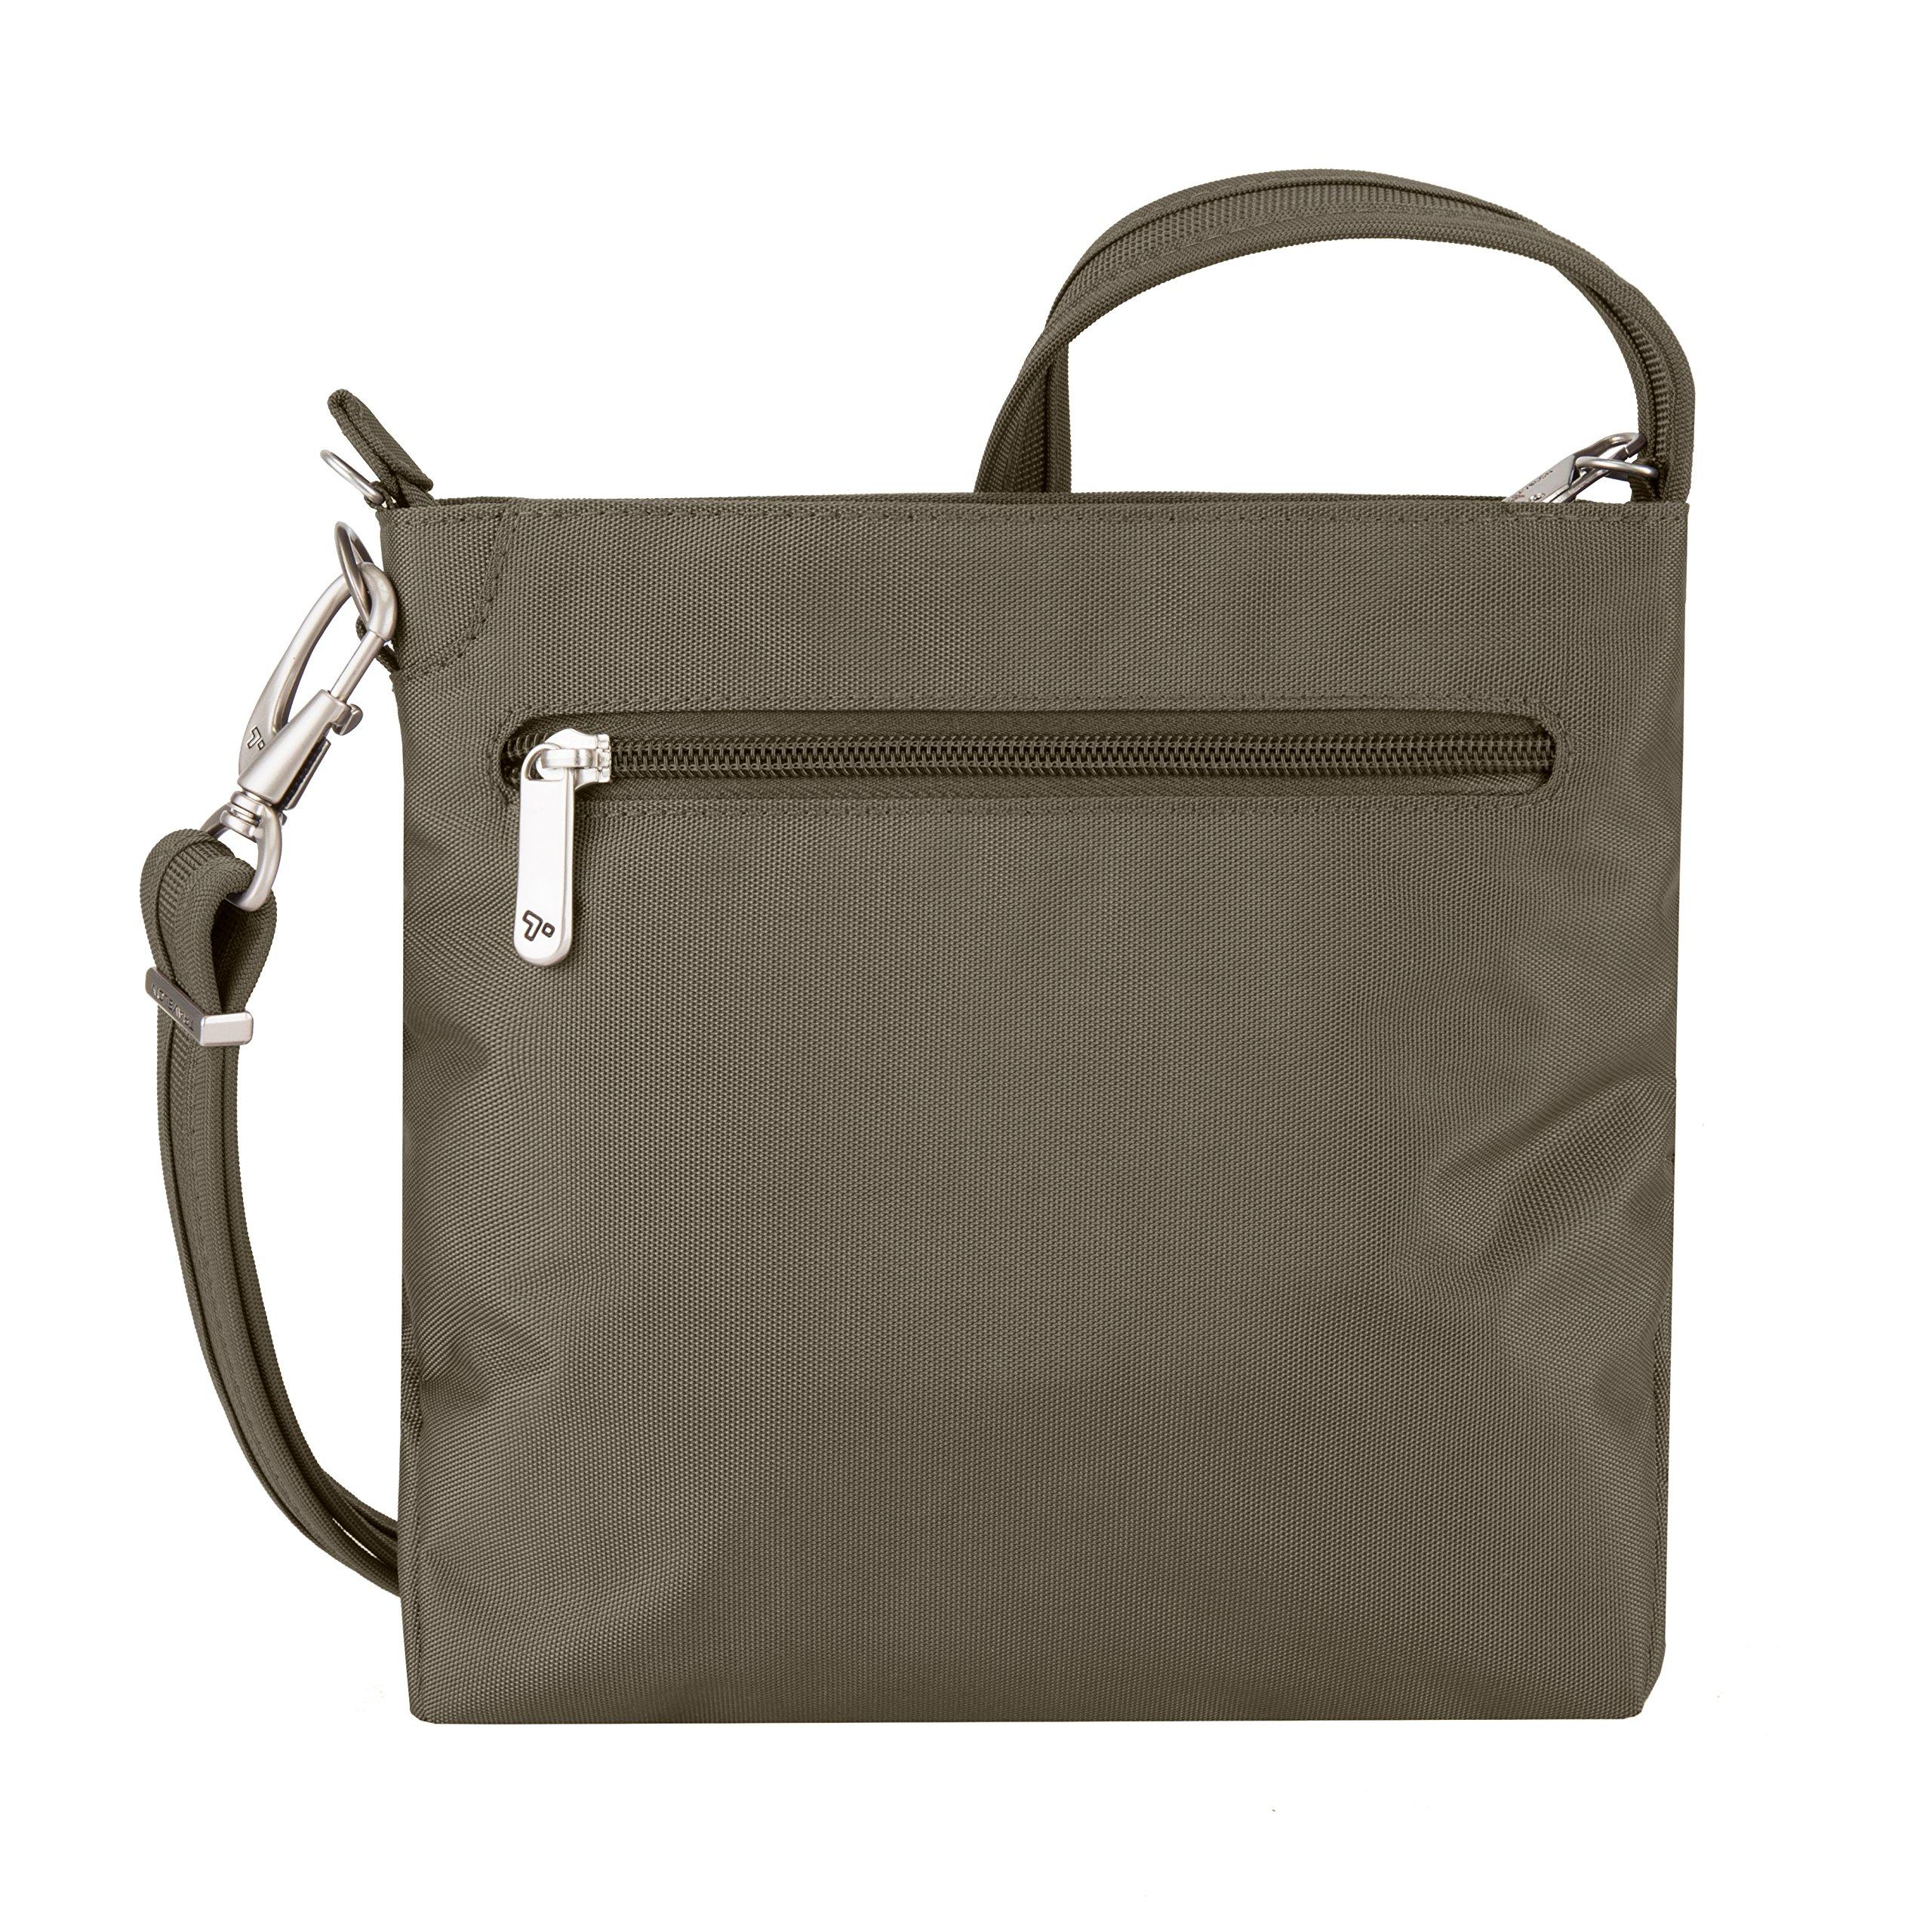 Travelon Women's Anti-theft Classic Mini Shoulder Bag Sling Tote, Nutmeg by Travelon (Image #7)